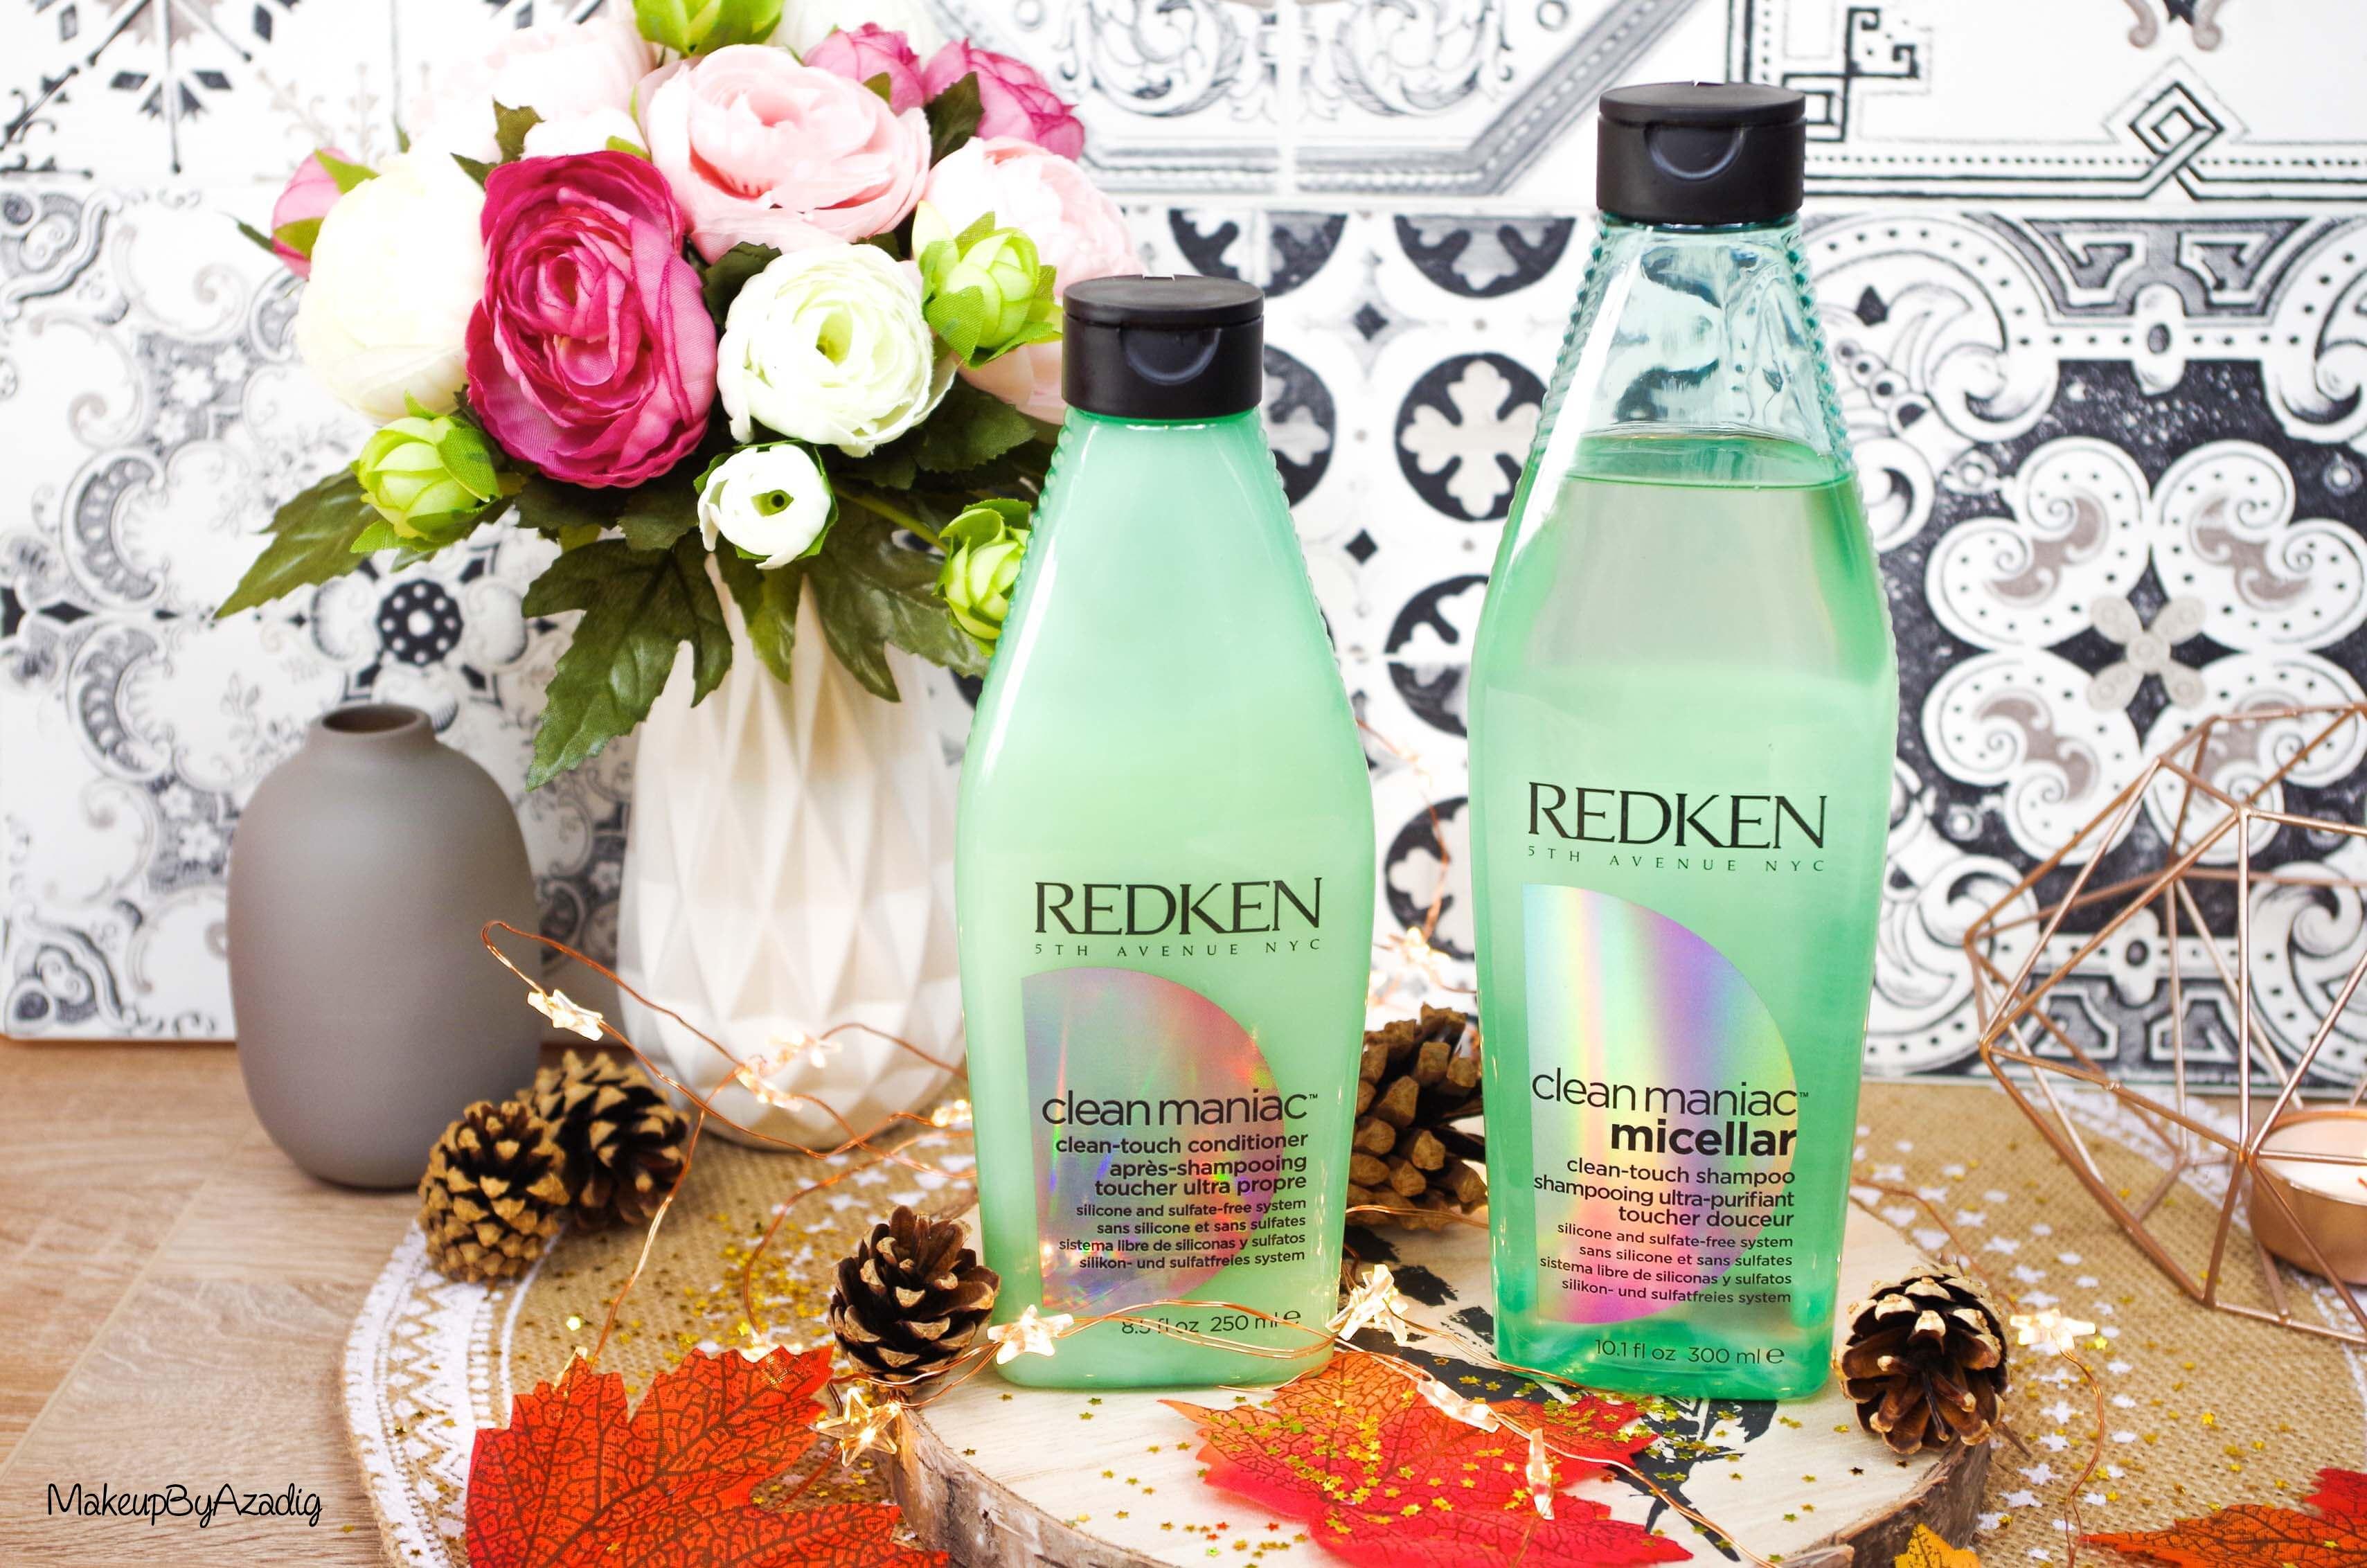 revue-shampooing-conditioner-clean-maniac-redken-programme-detox-anti-pollution-makeupbyazadig-cleanhair-sans-silicone-sulfate-prix